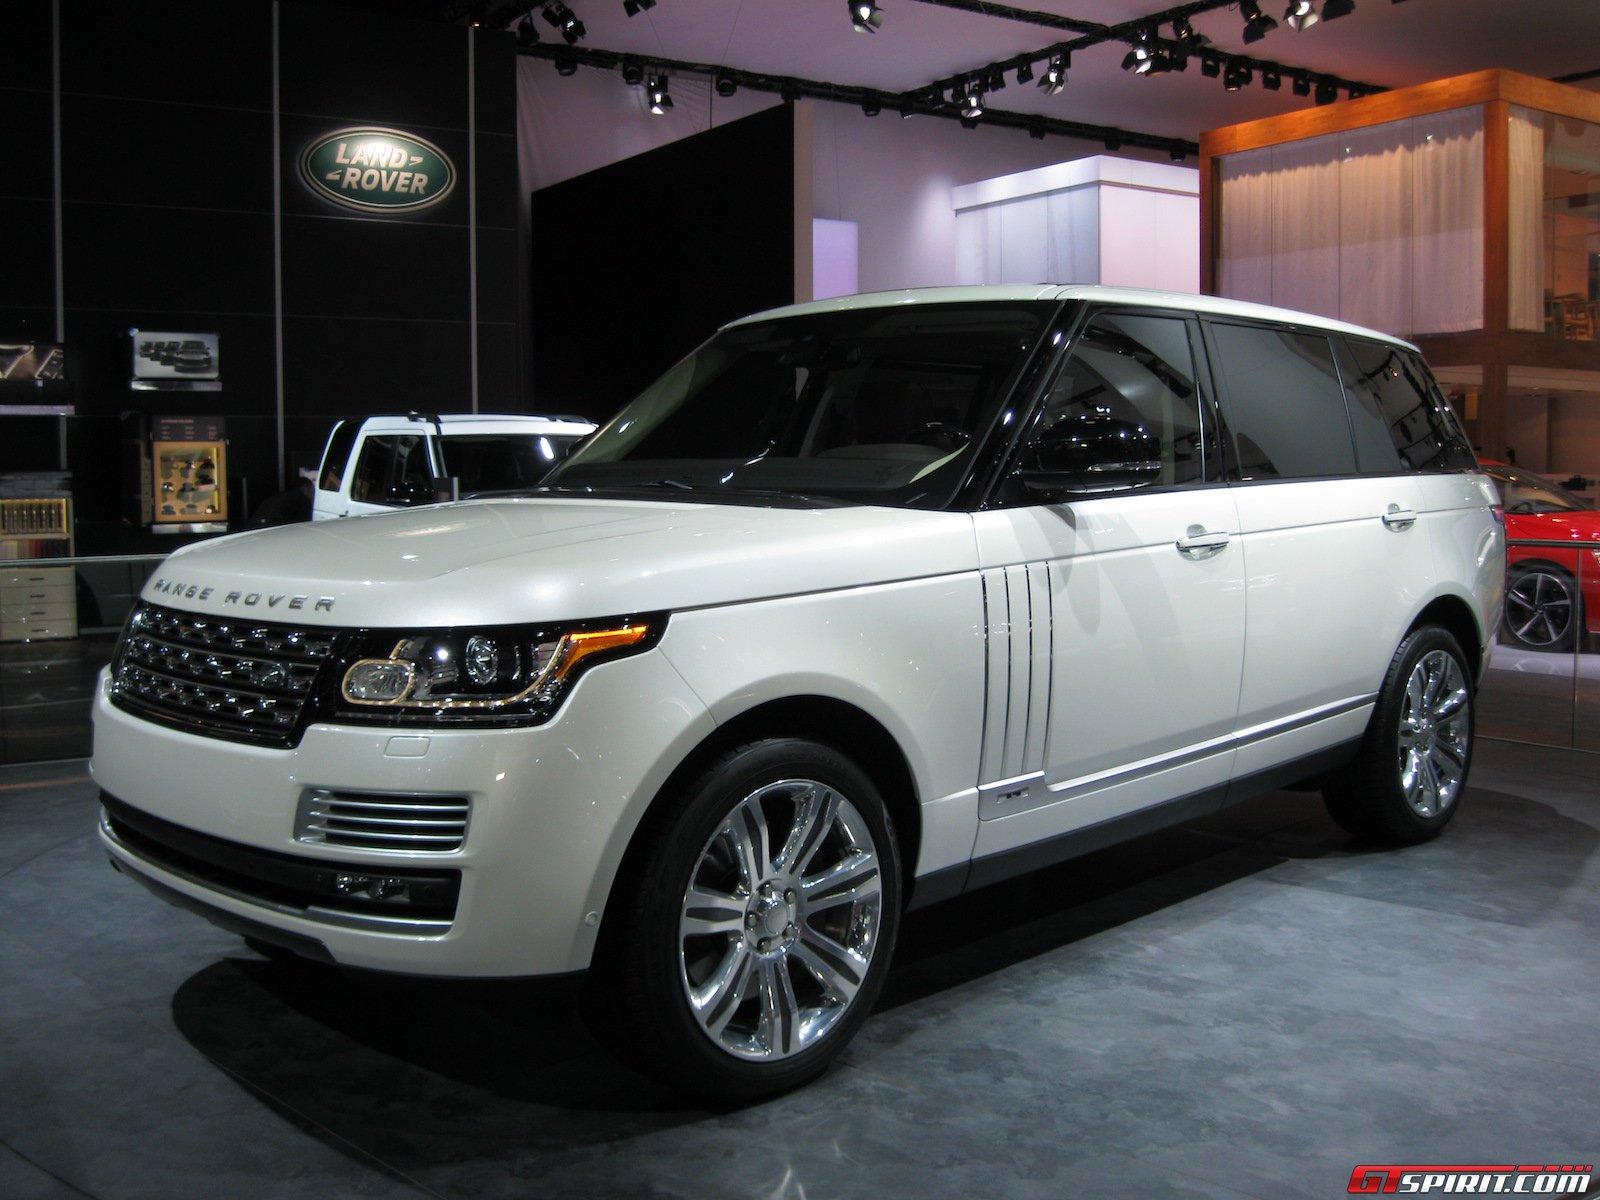 detroit 2014 range rover long wheelbase gtspirit. Black Bedroom Furniture Sets. Home Design Ideas